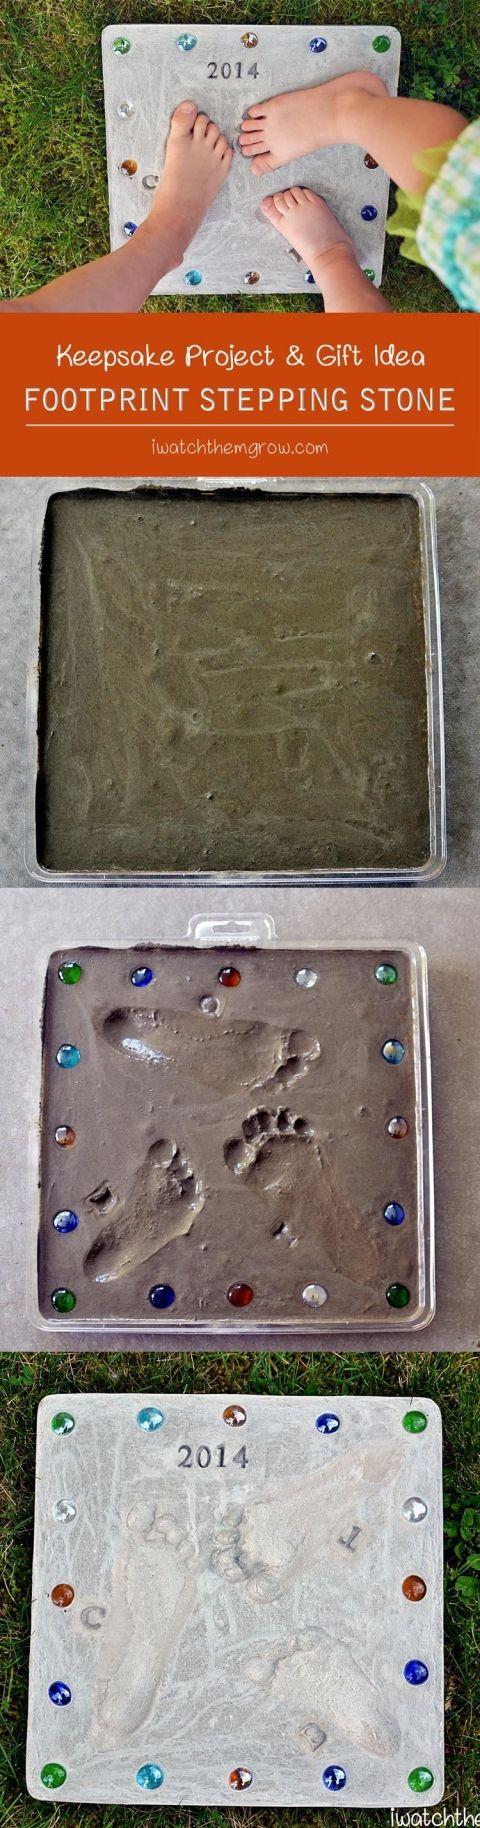 Footprint Stepping Stone Keepsake craft for kids